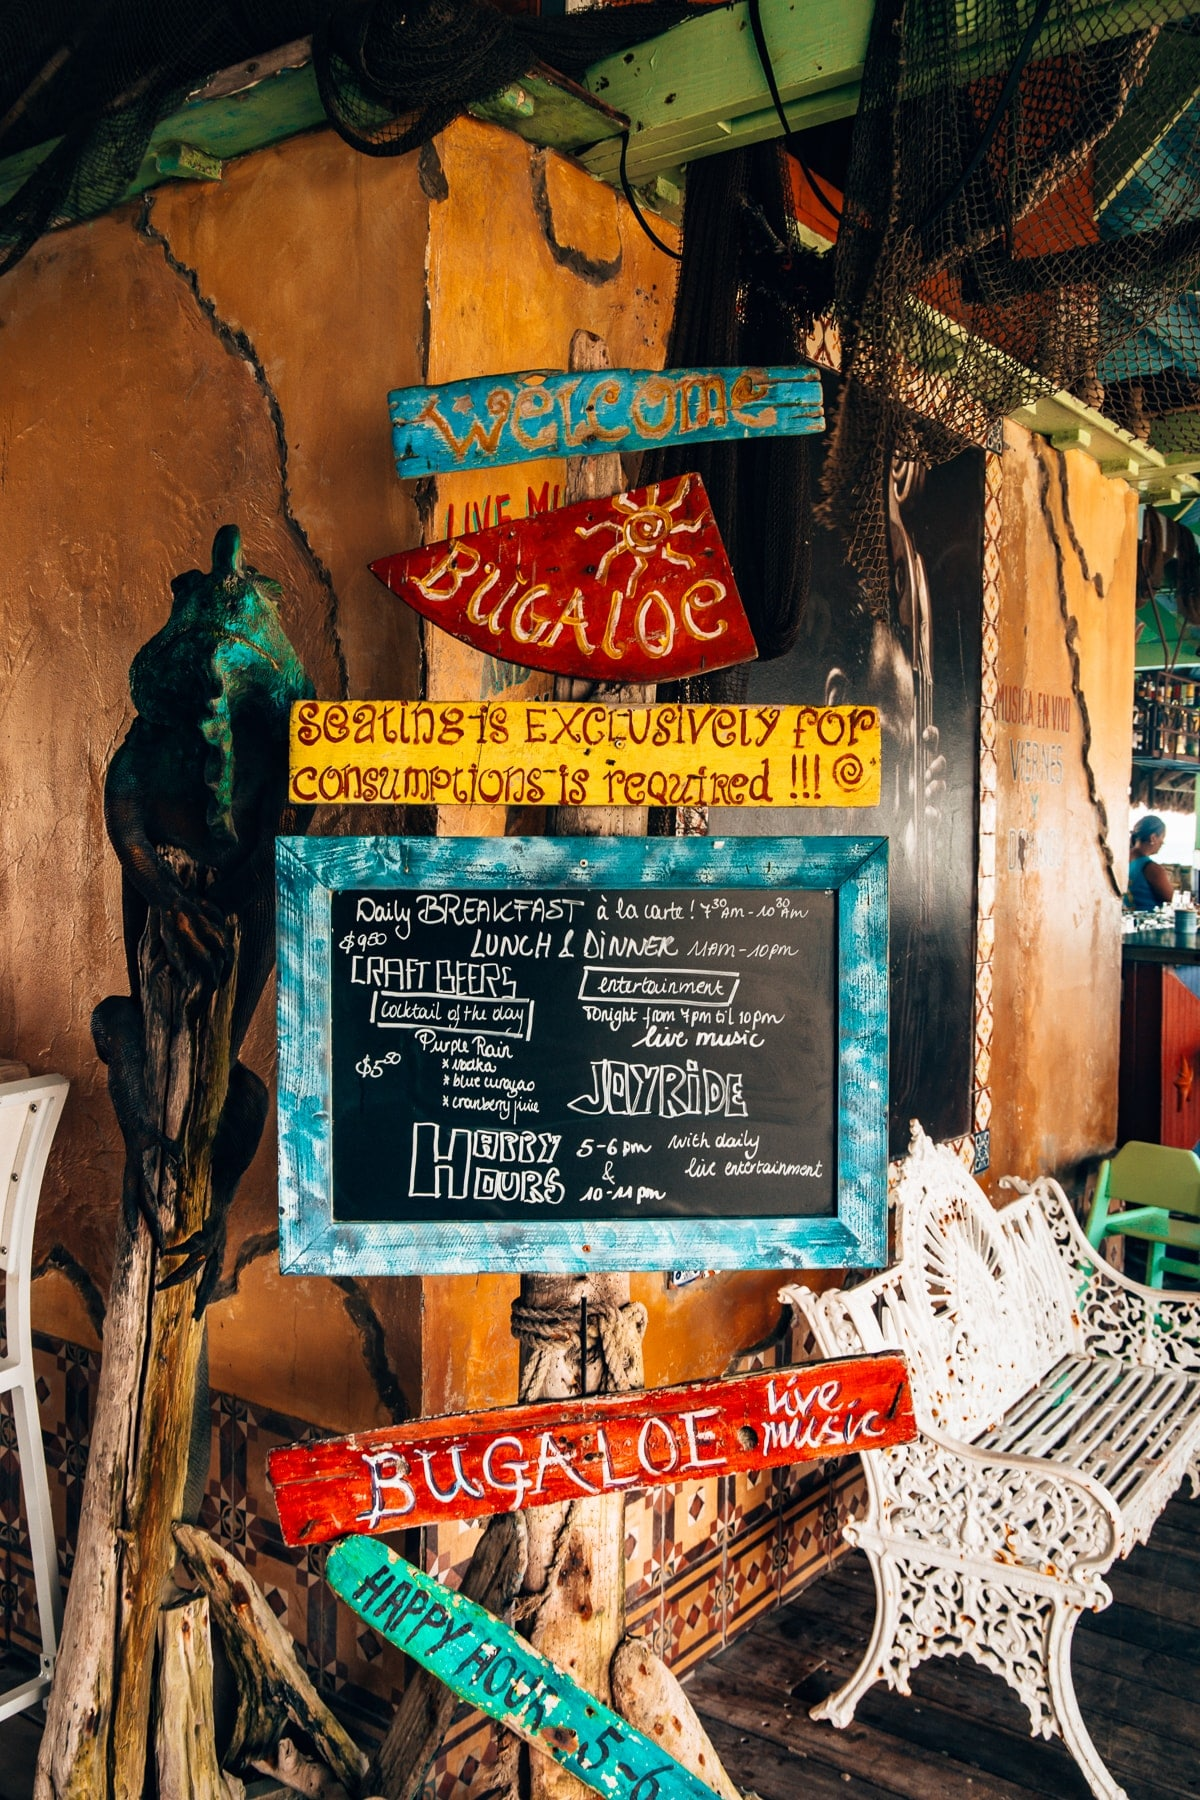 Top Food Spots auf Aruba: Bugaloe Beach Bar